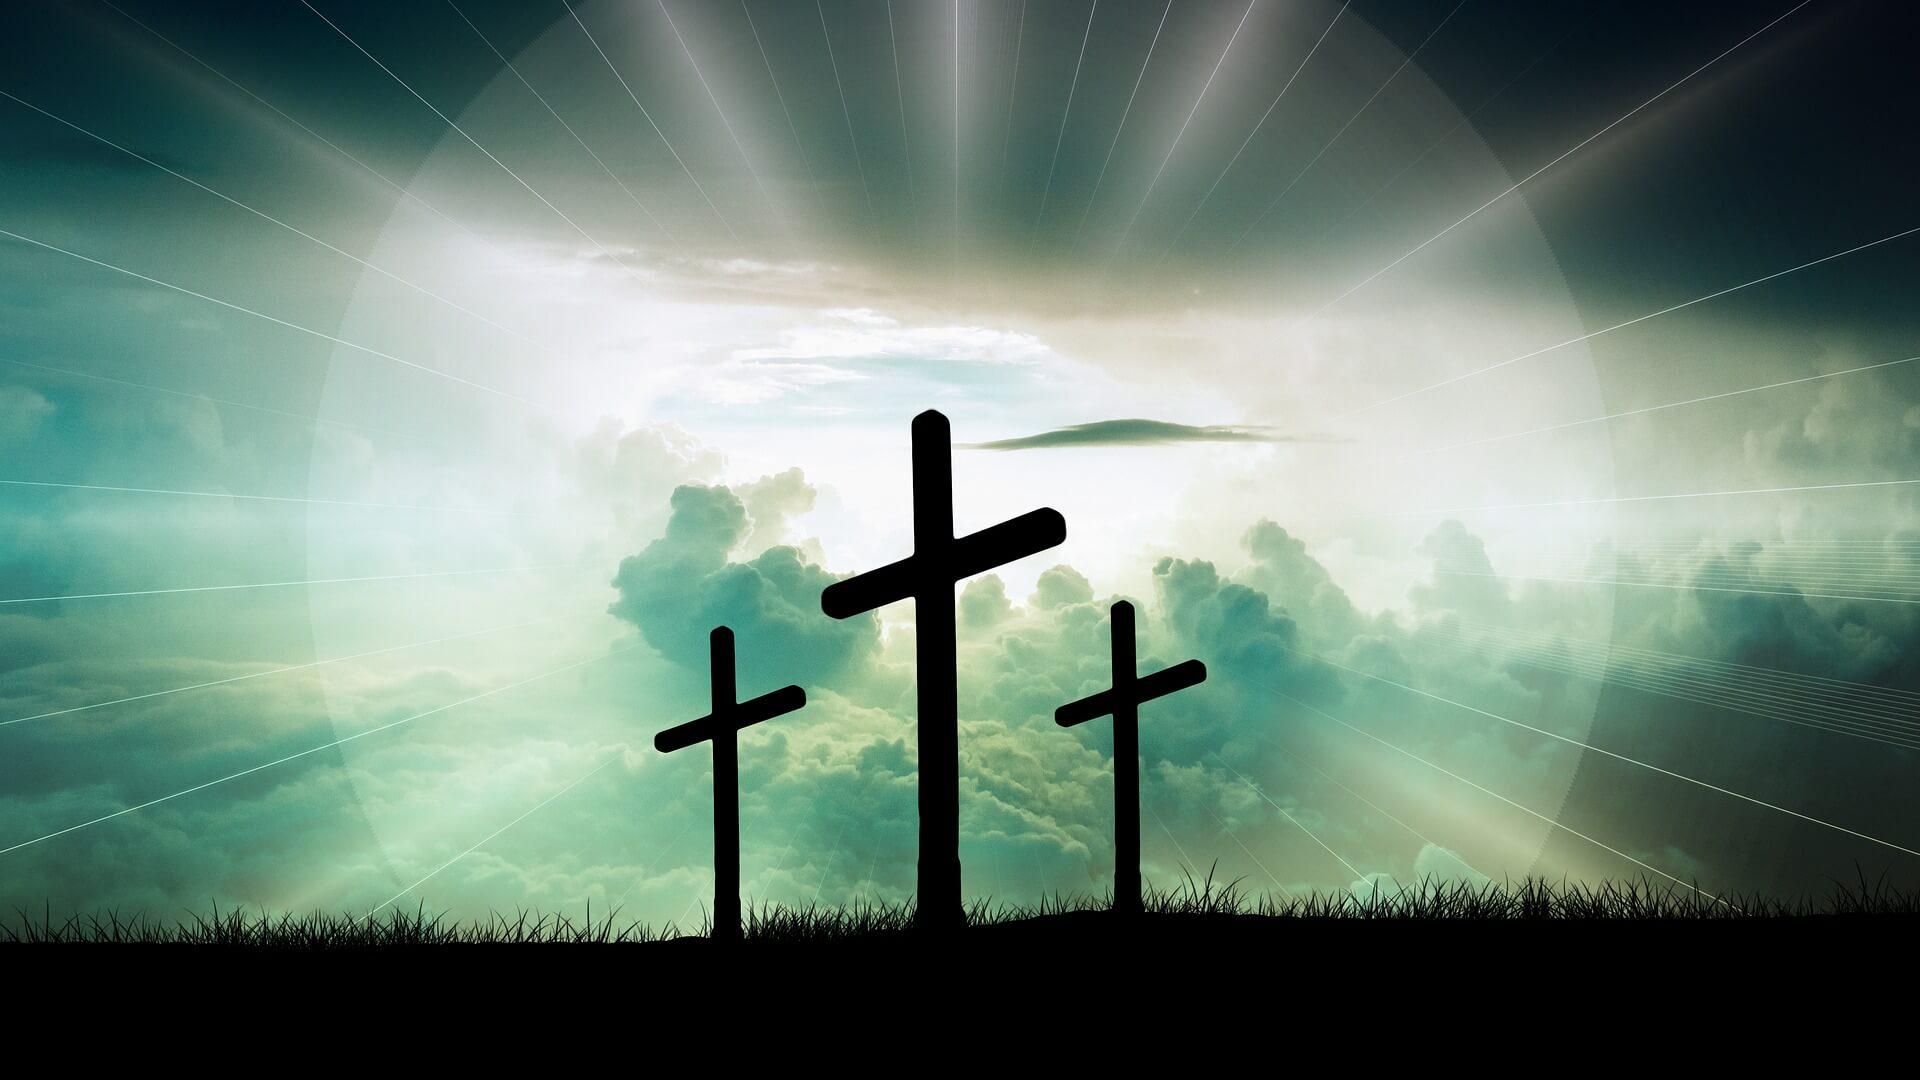 Symbolbild Ostern, Emmaus: 3 Kreuze vor dem Mond